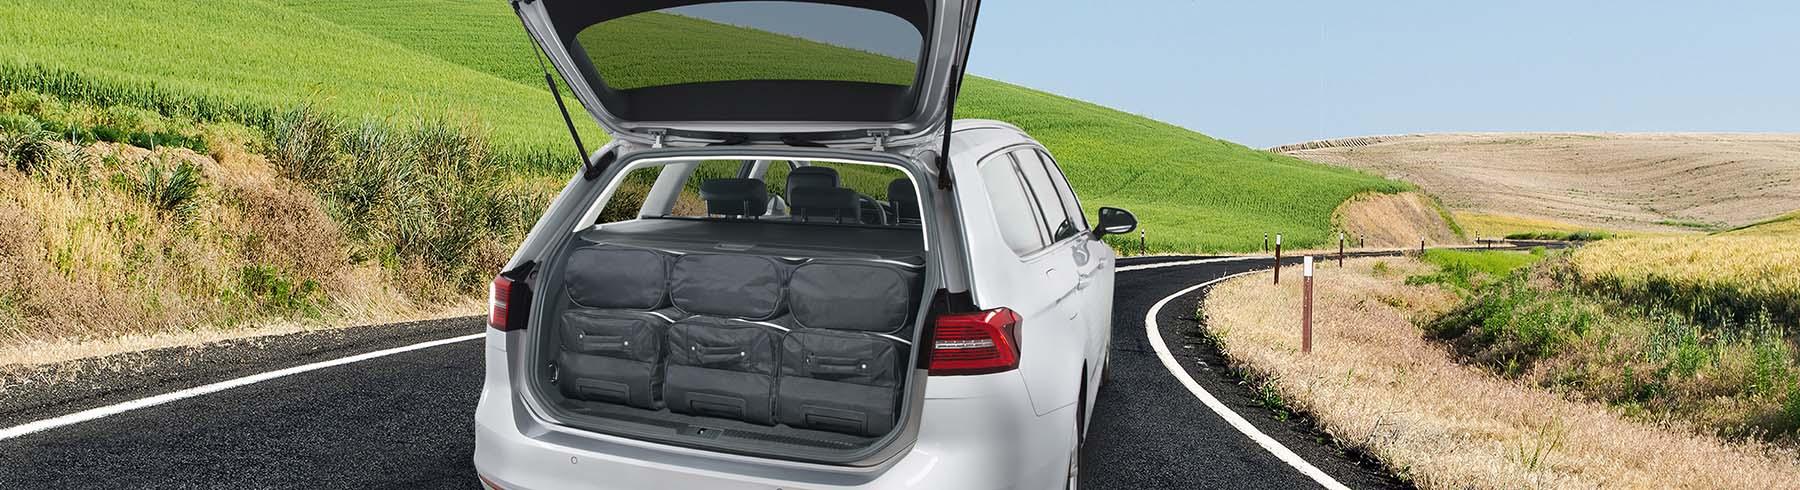 car-bags-concept-summer-03